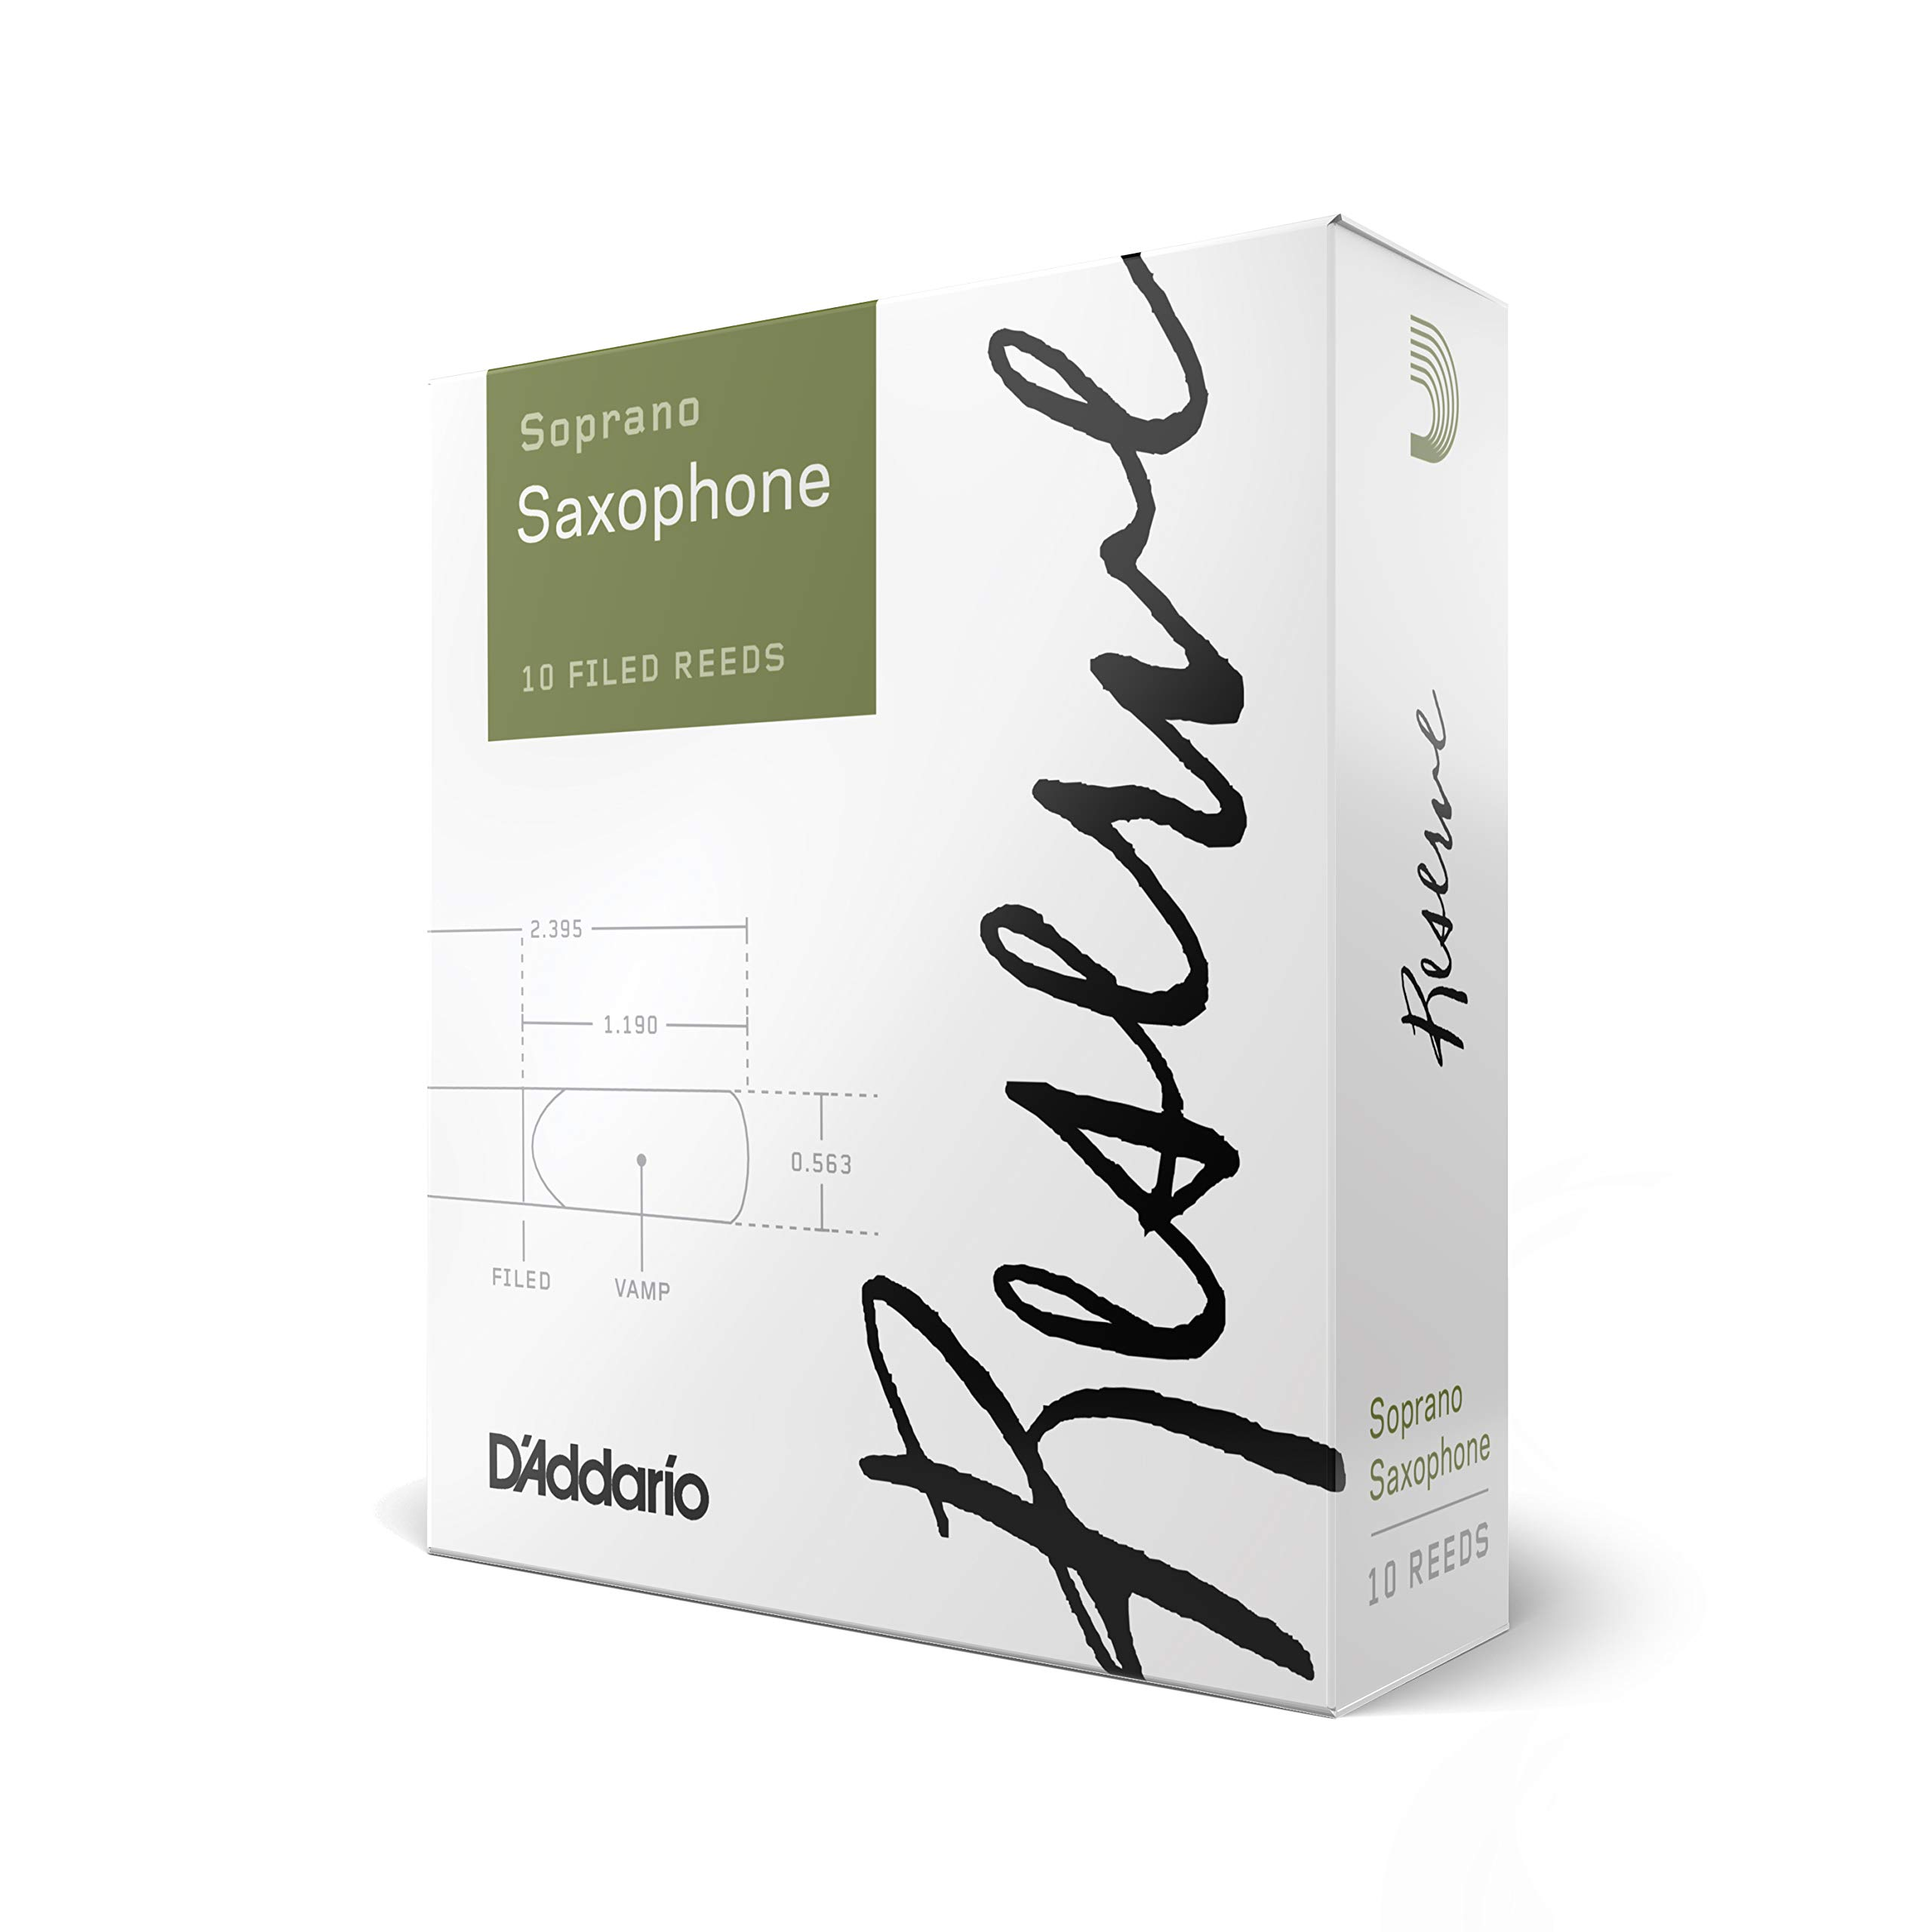 D'Addario Reserve Soprano Saxophone Reeds, Strength 3.0+,10-Pack